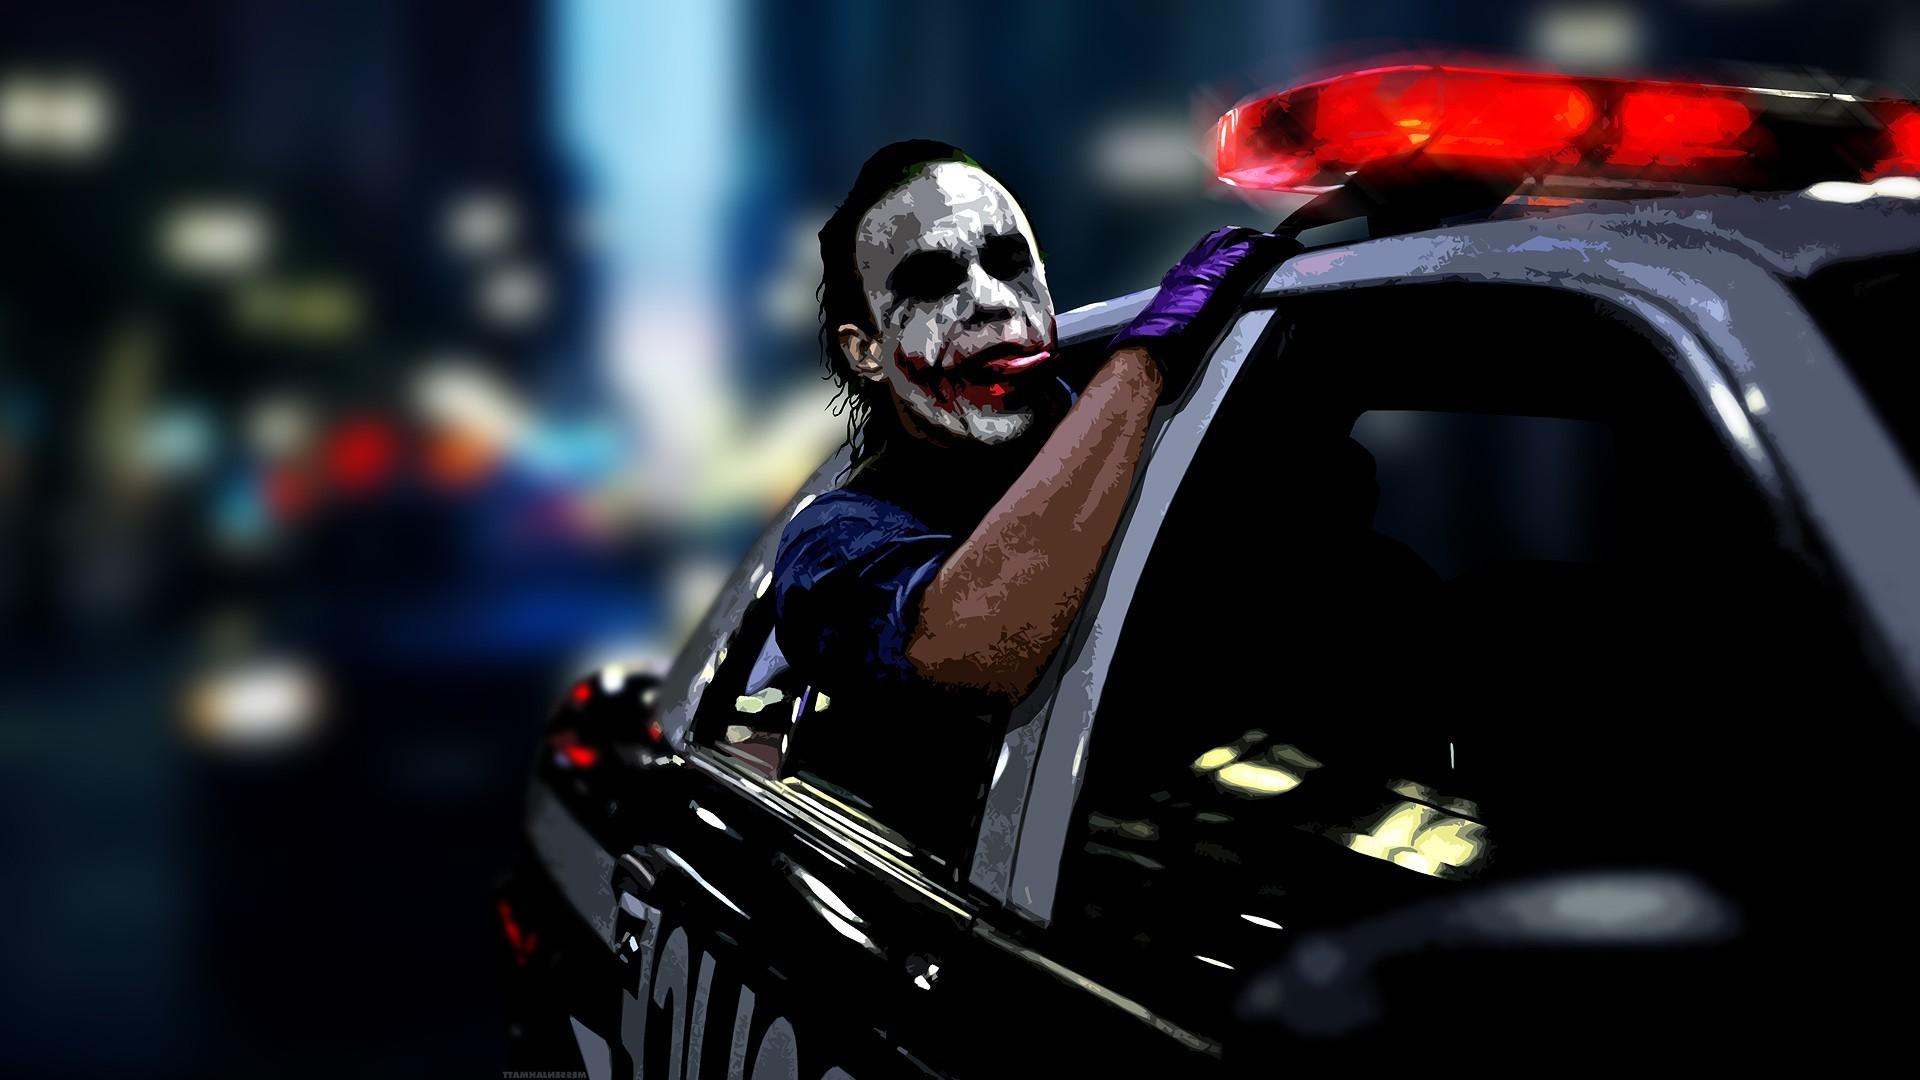 anime, Police, Digital Art, Heath Ledger, Joker, Batman, MessenjahMatt  Wallpapers HD / Desktop and Mobile Backgrounds